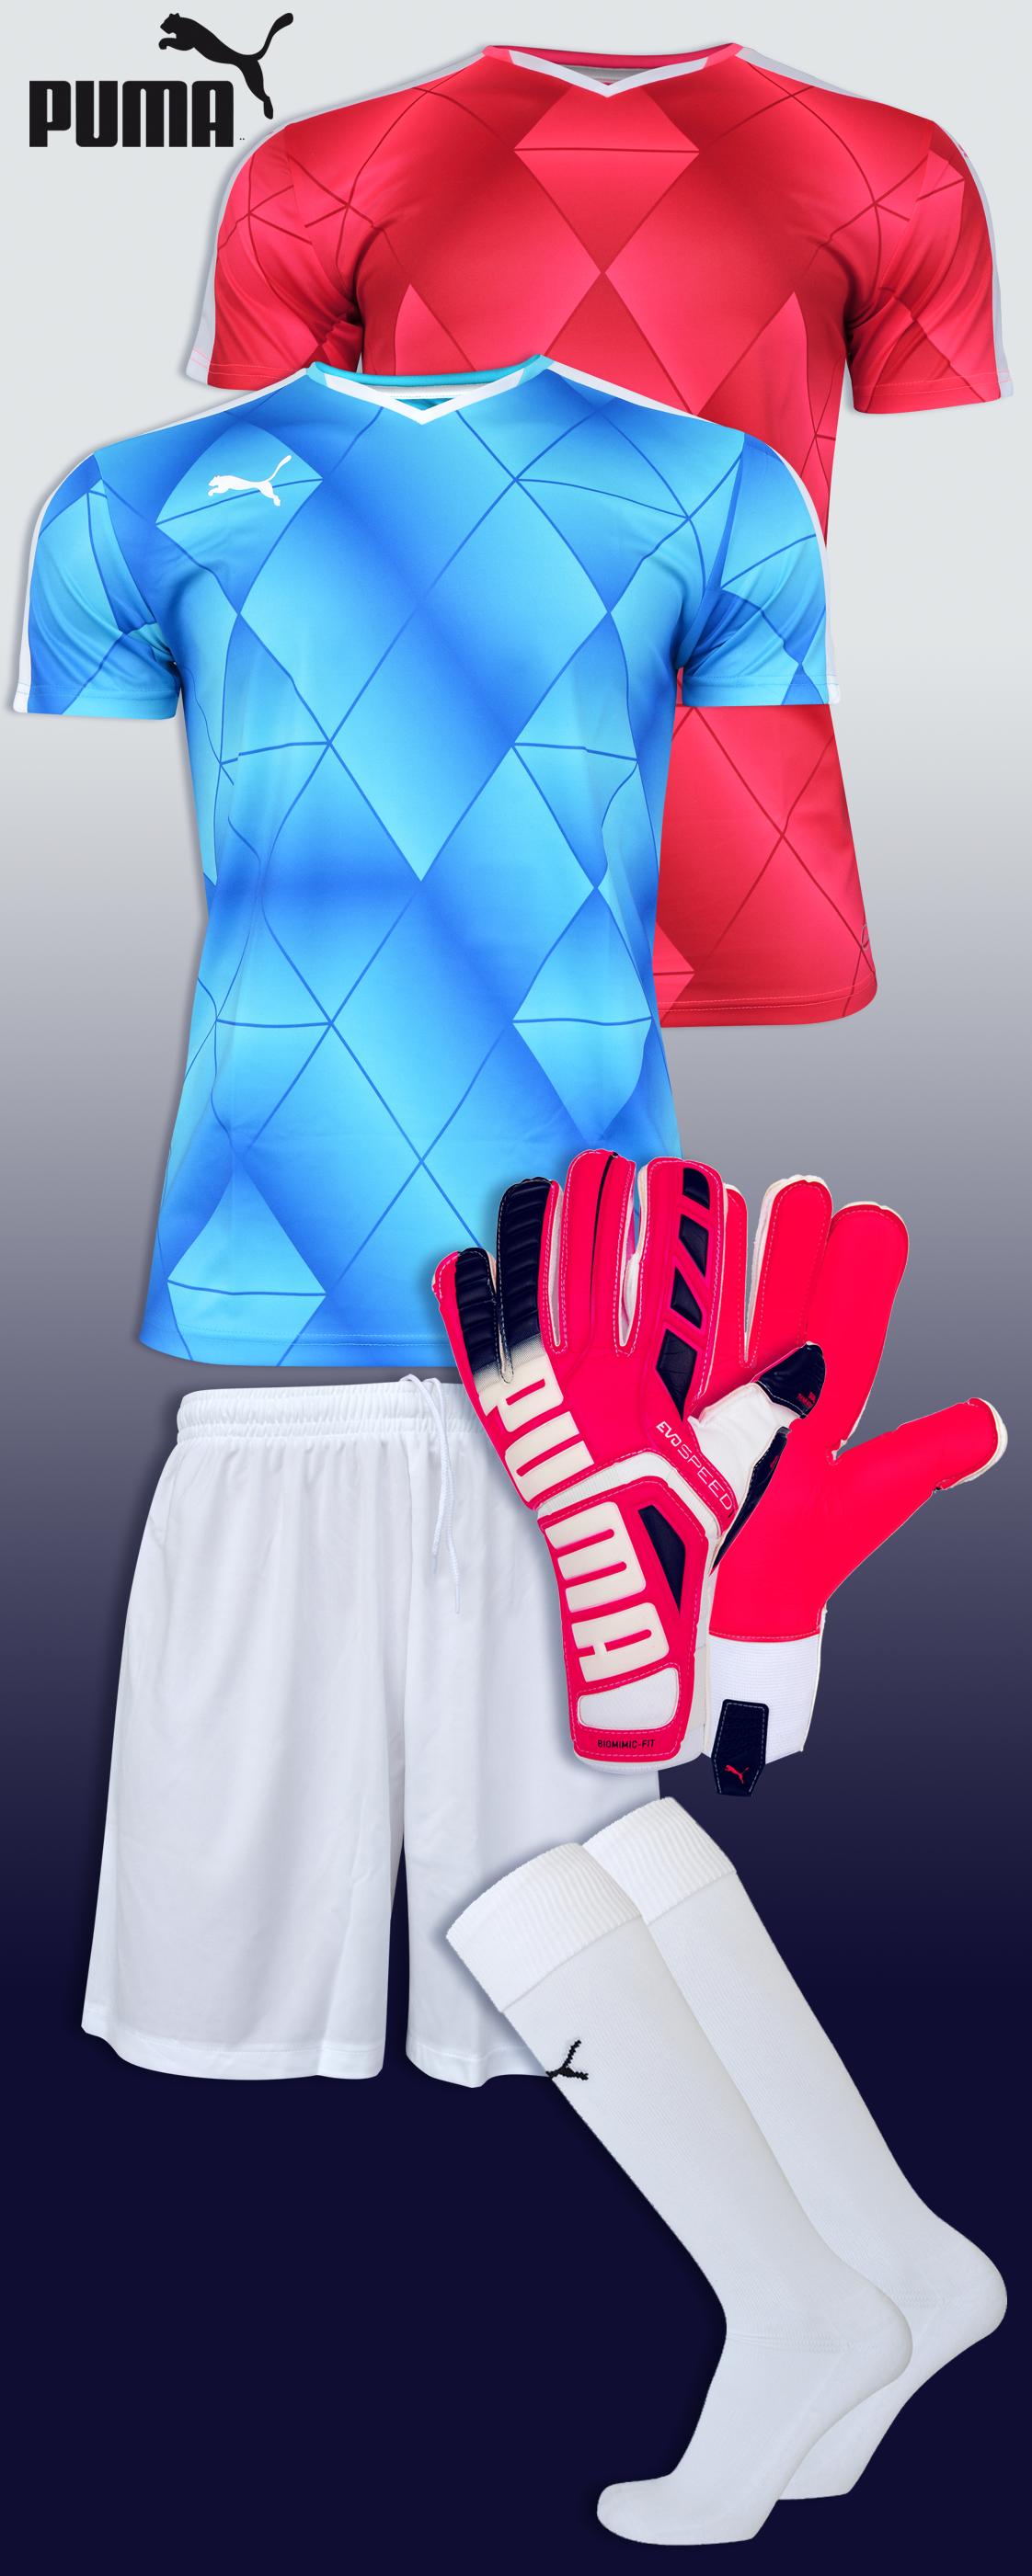 Goalkeeper Set Puma 2015